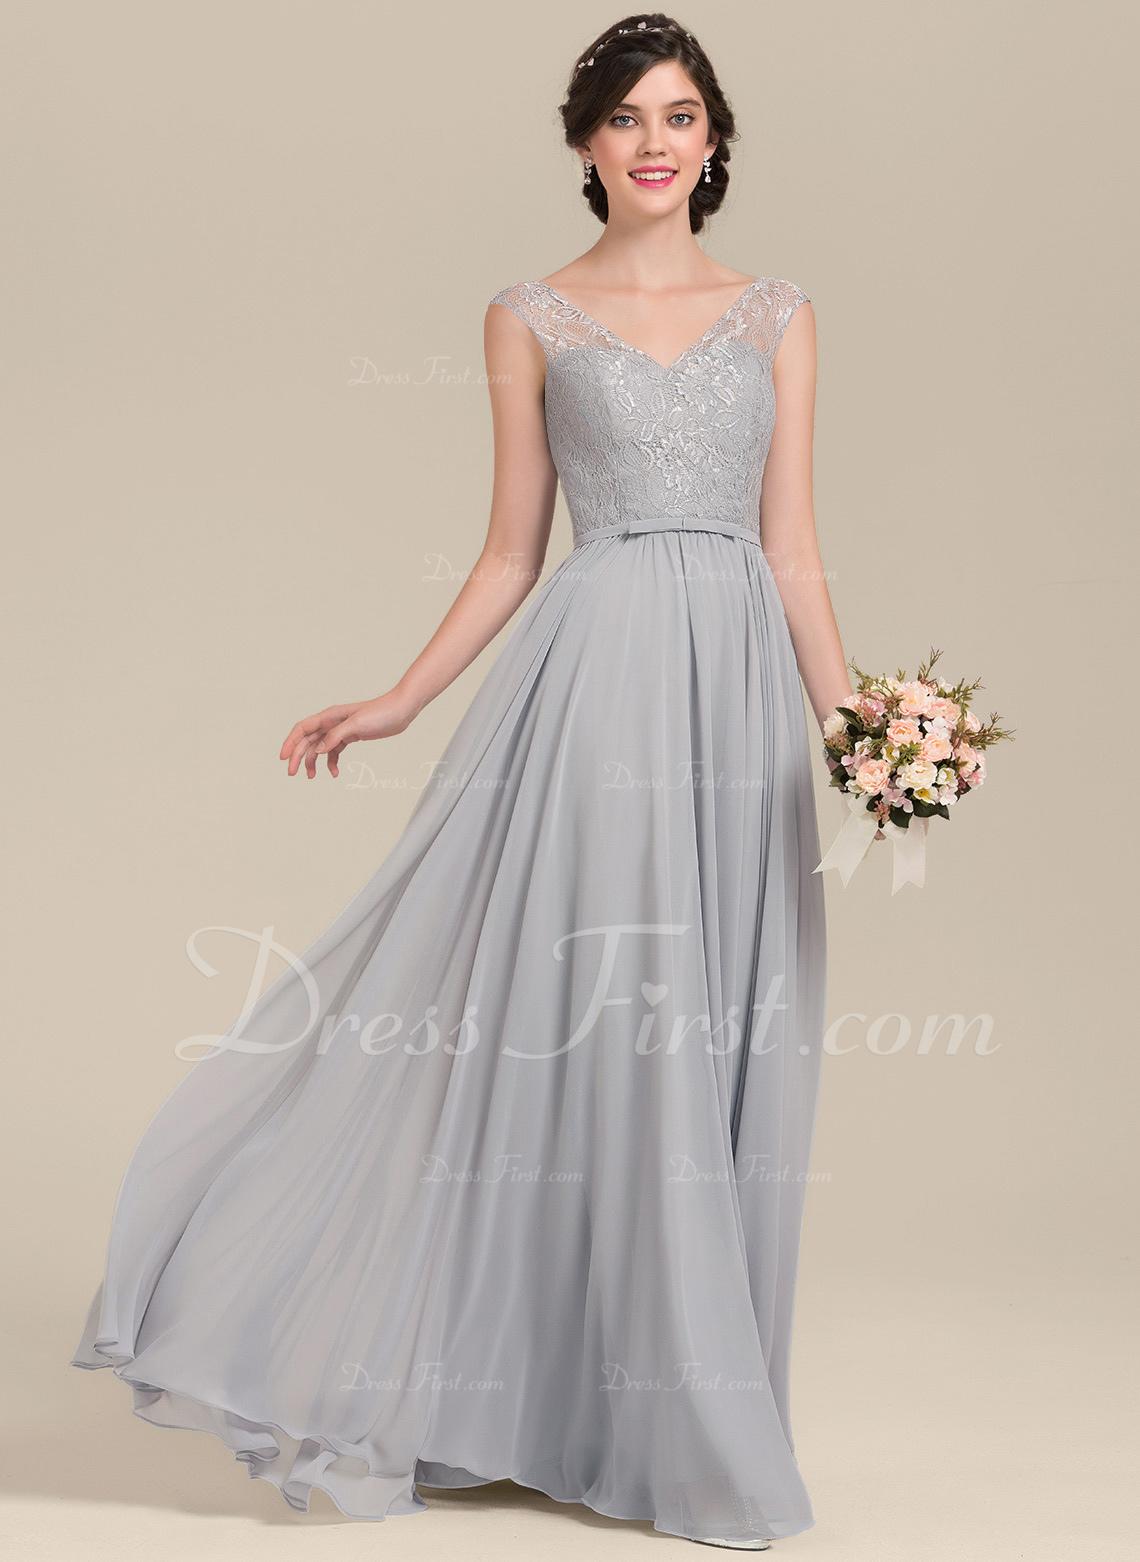 A-Line/Princess V-neck Floor-Length Chiffon Lace Bridesmaid Dress With Bow(s)